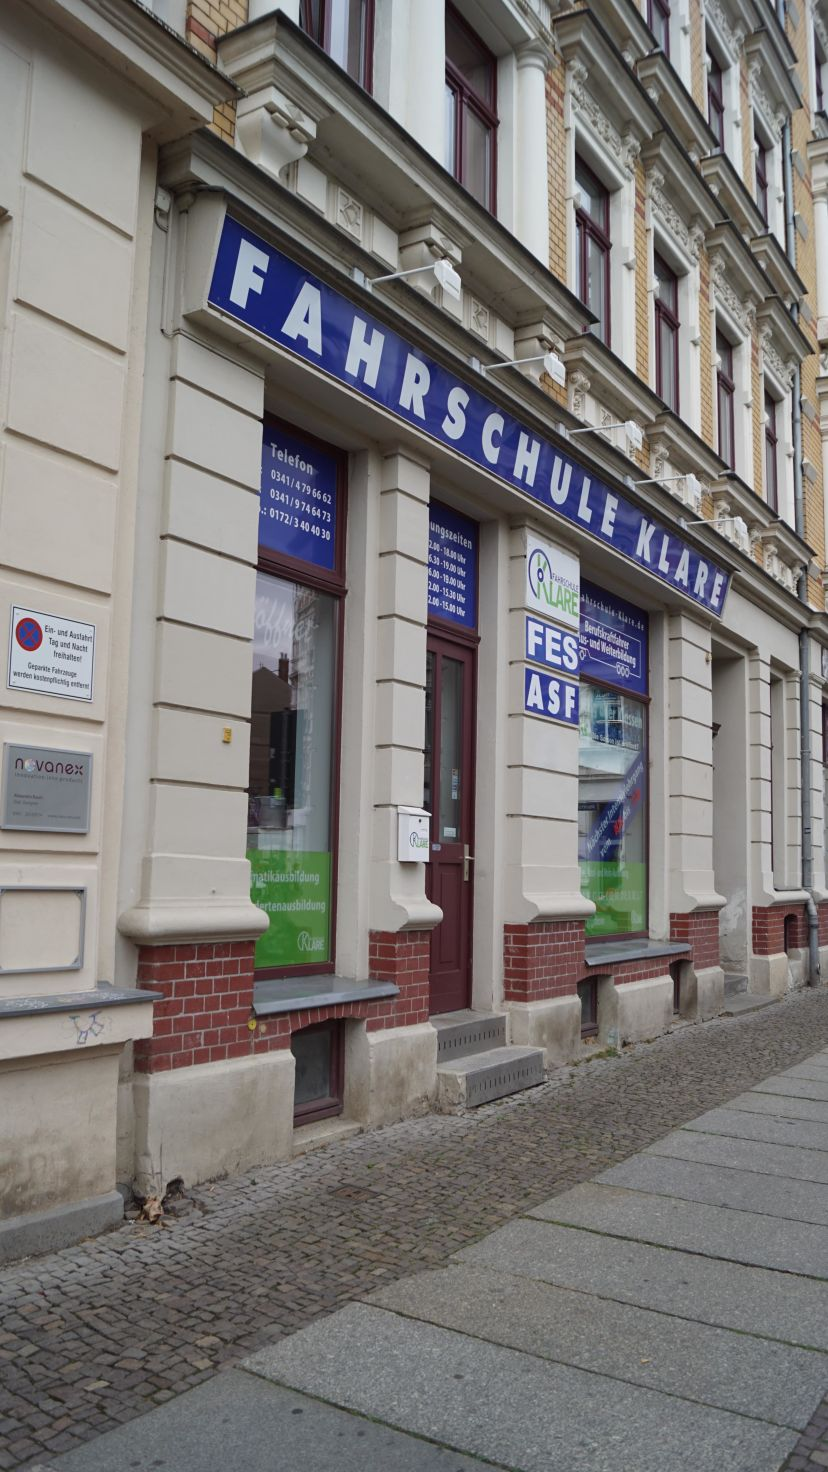 Fahrschule Klare Leipzig Altlindenau 3